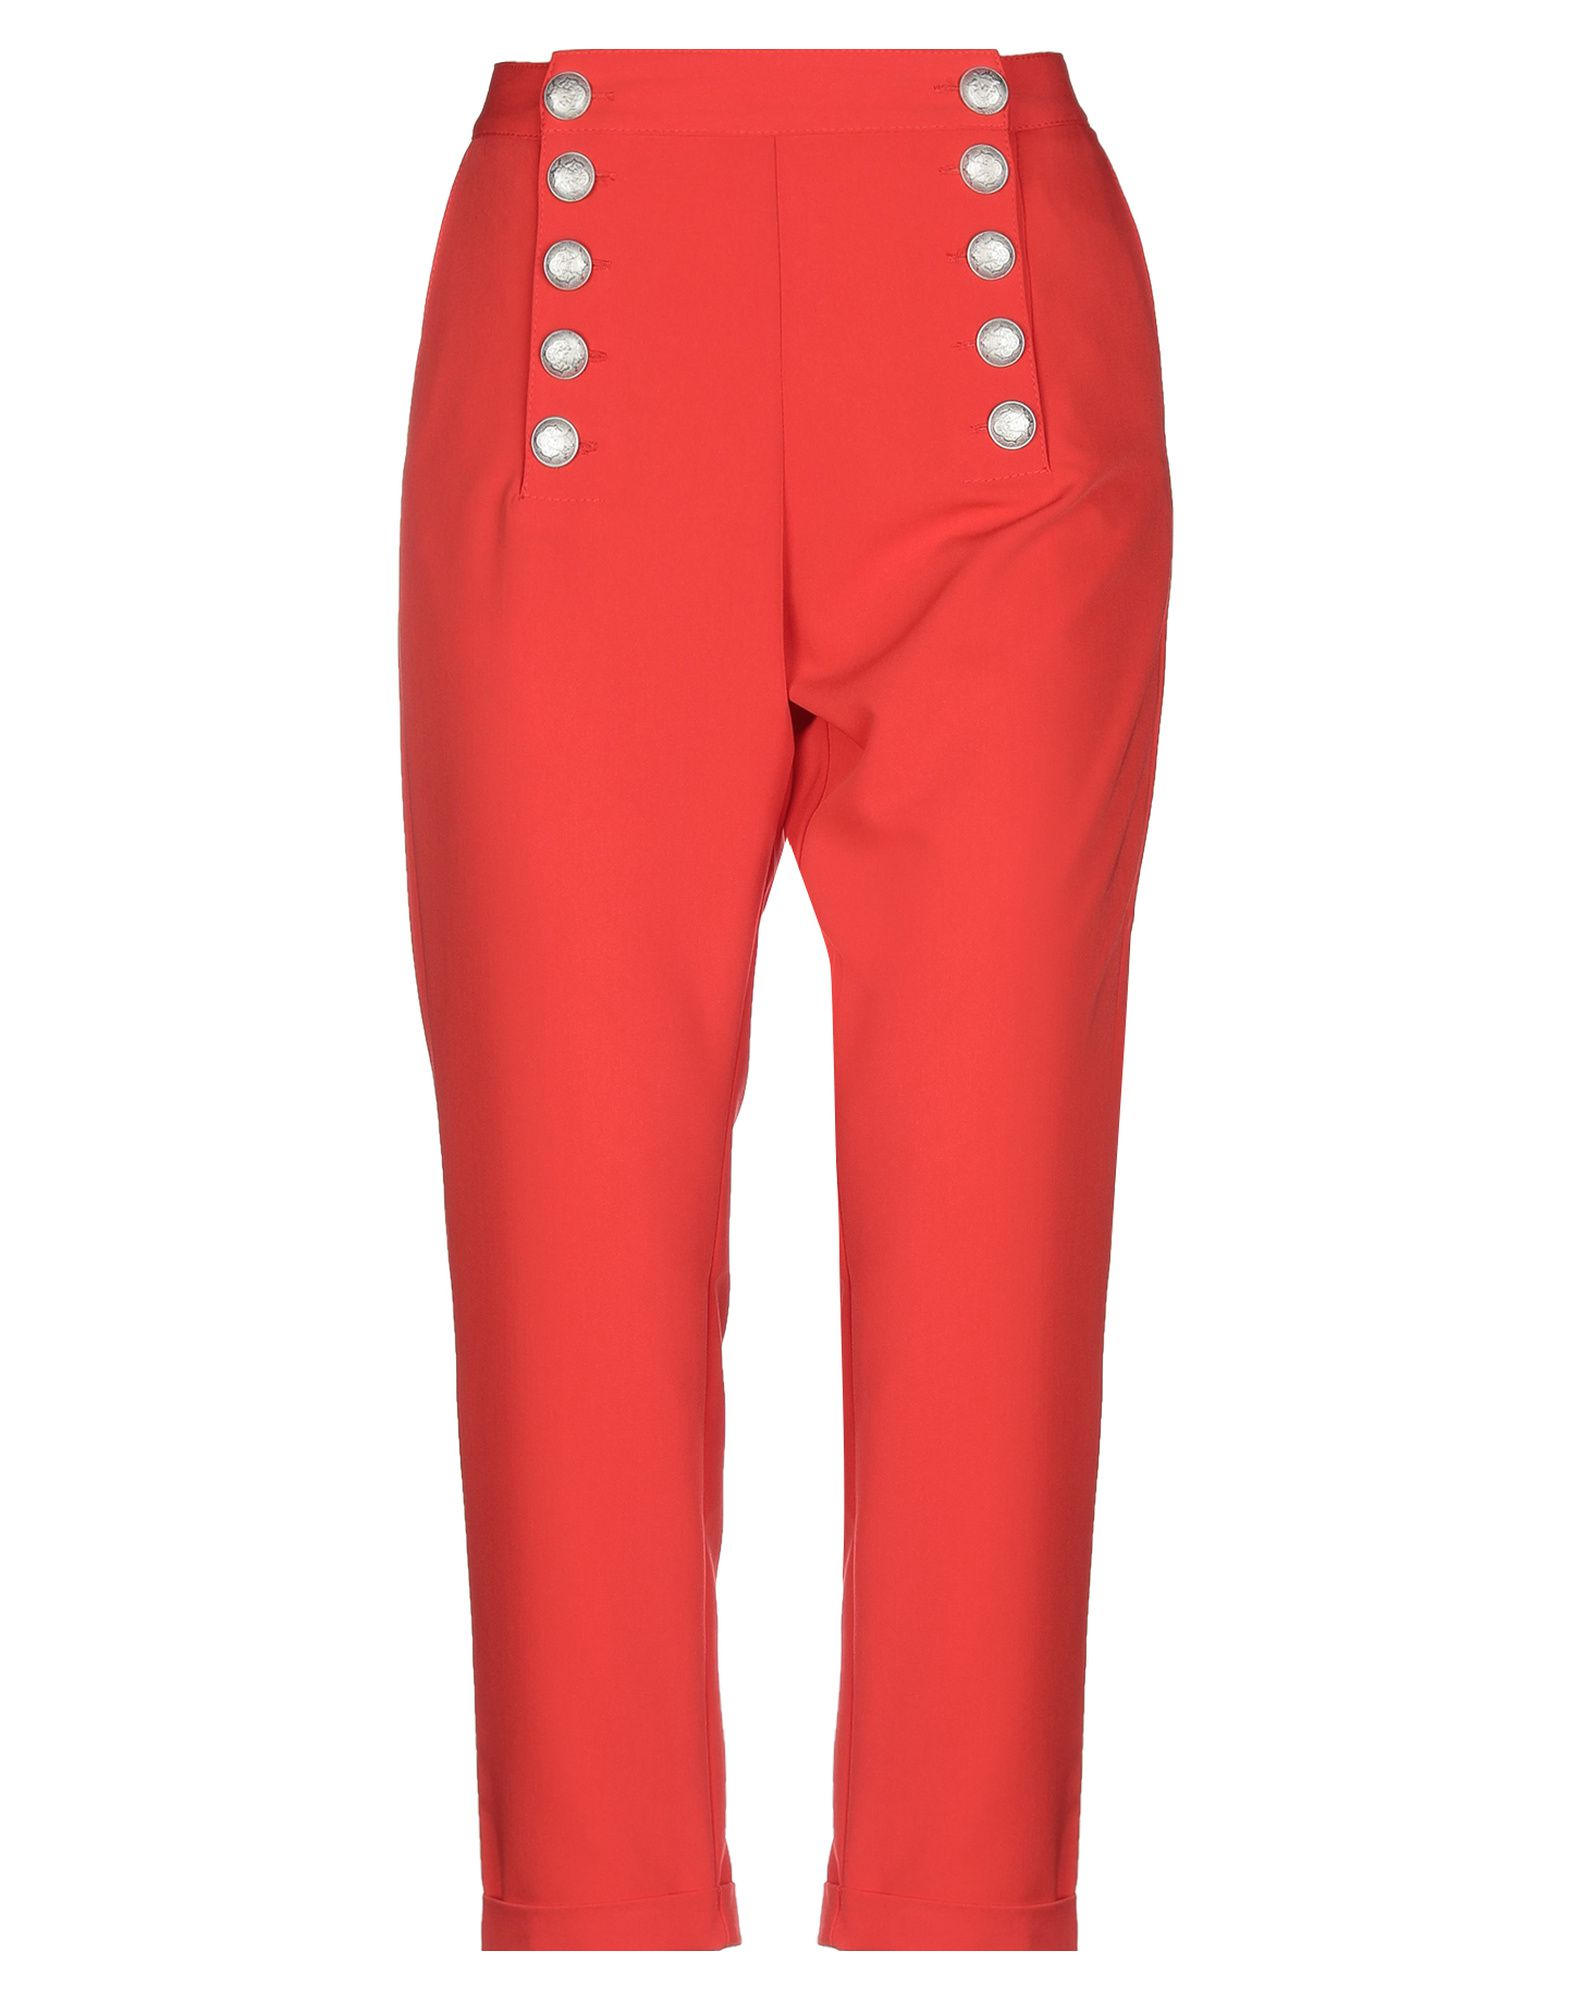 IMPERIAL Повседневные брюки imperial повседневные брюки